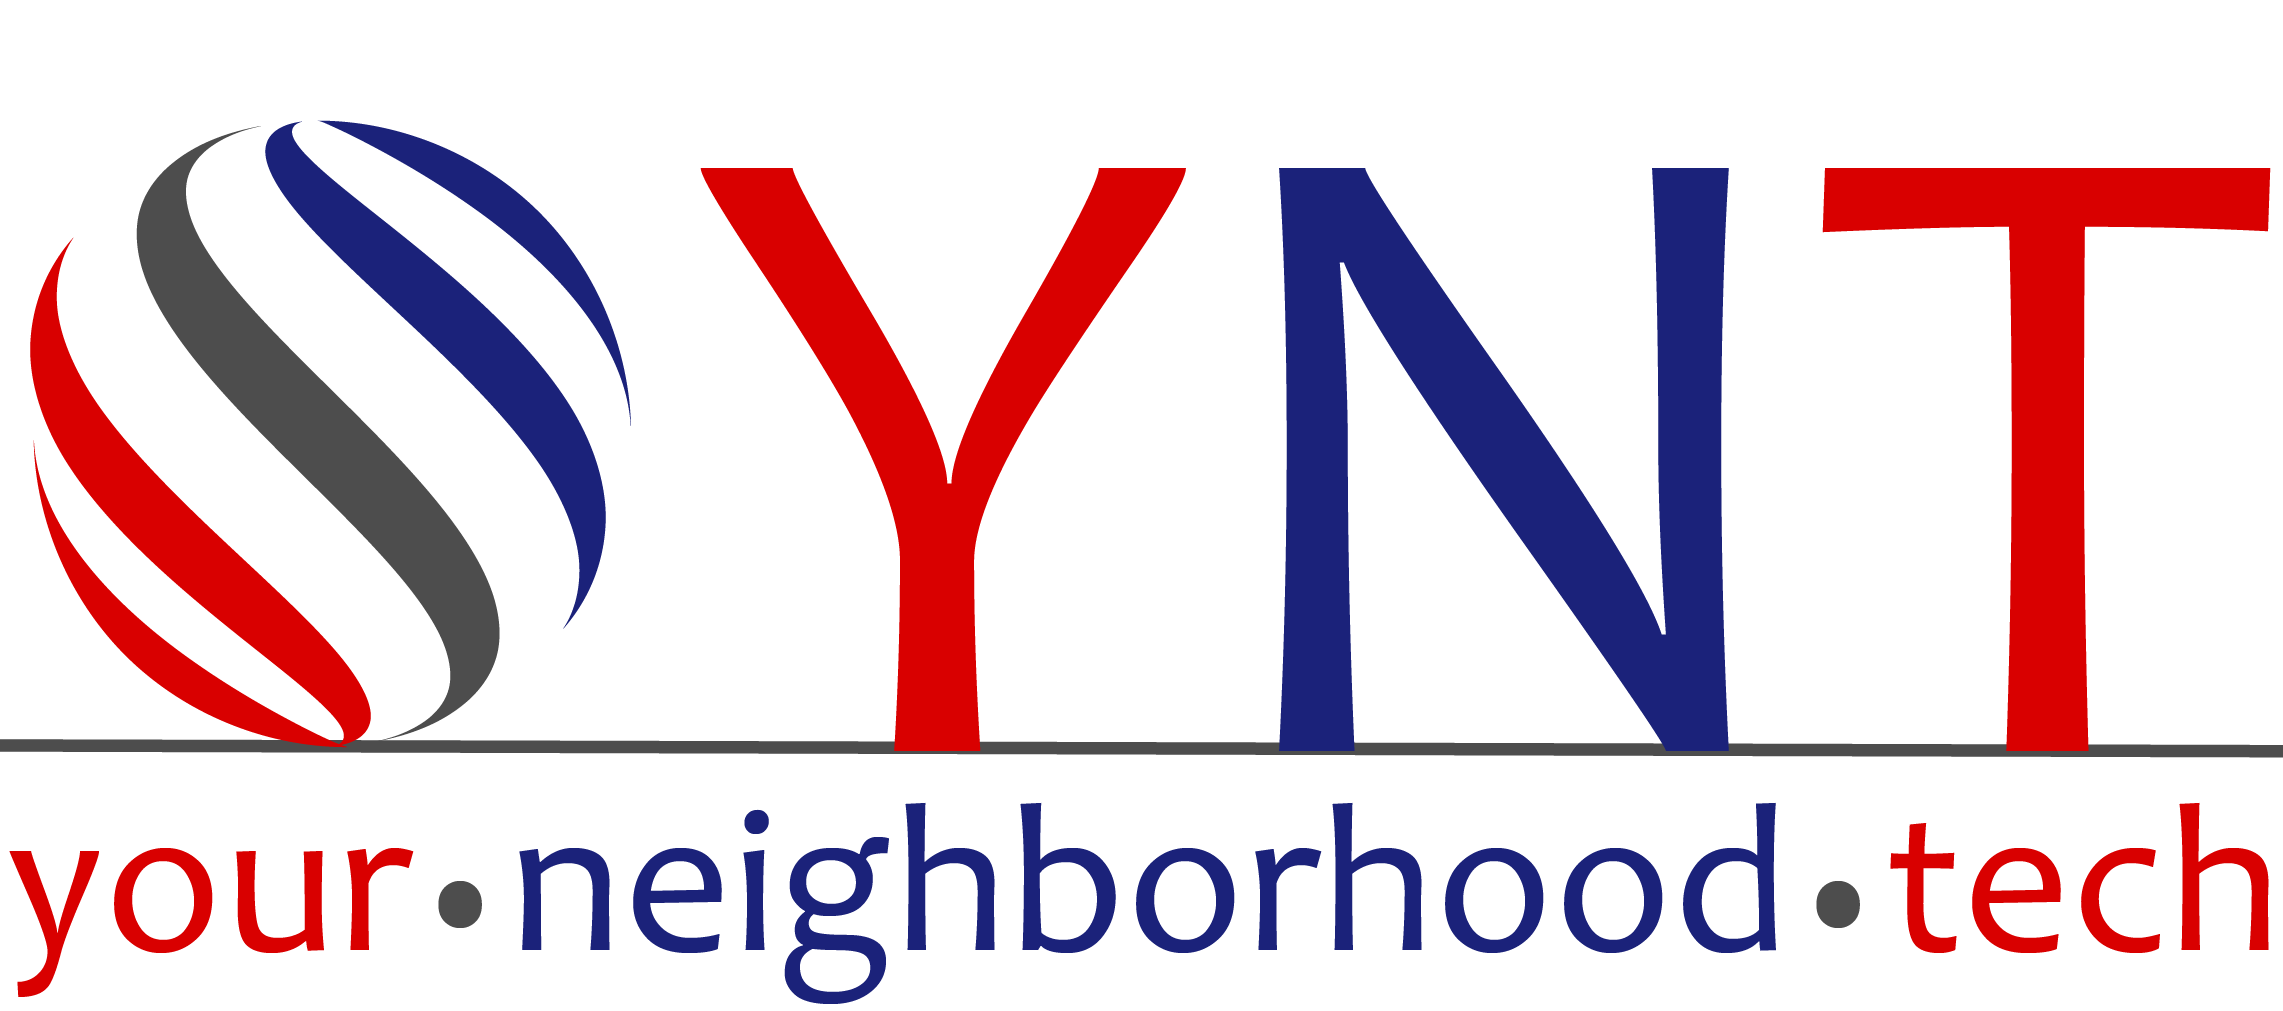 Sacramento Managed IT Services | Web Development | Your Neighborhood Tech